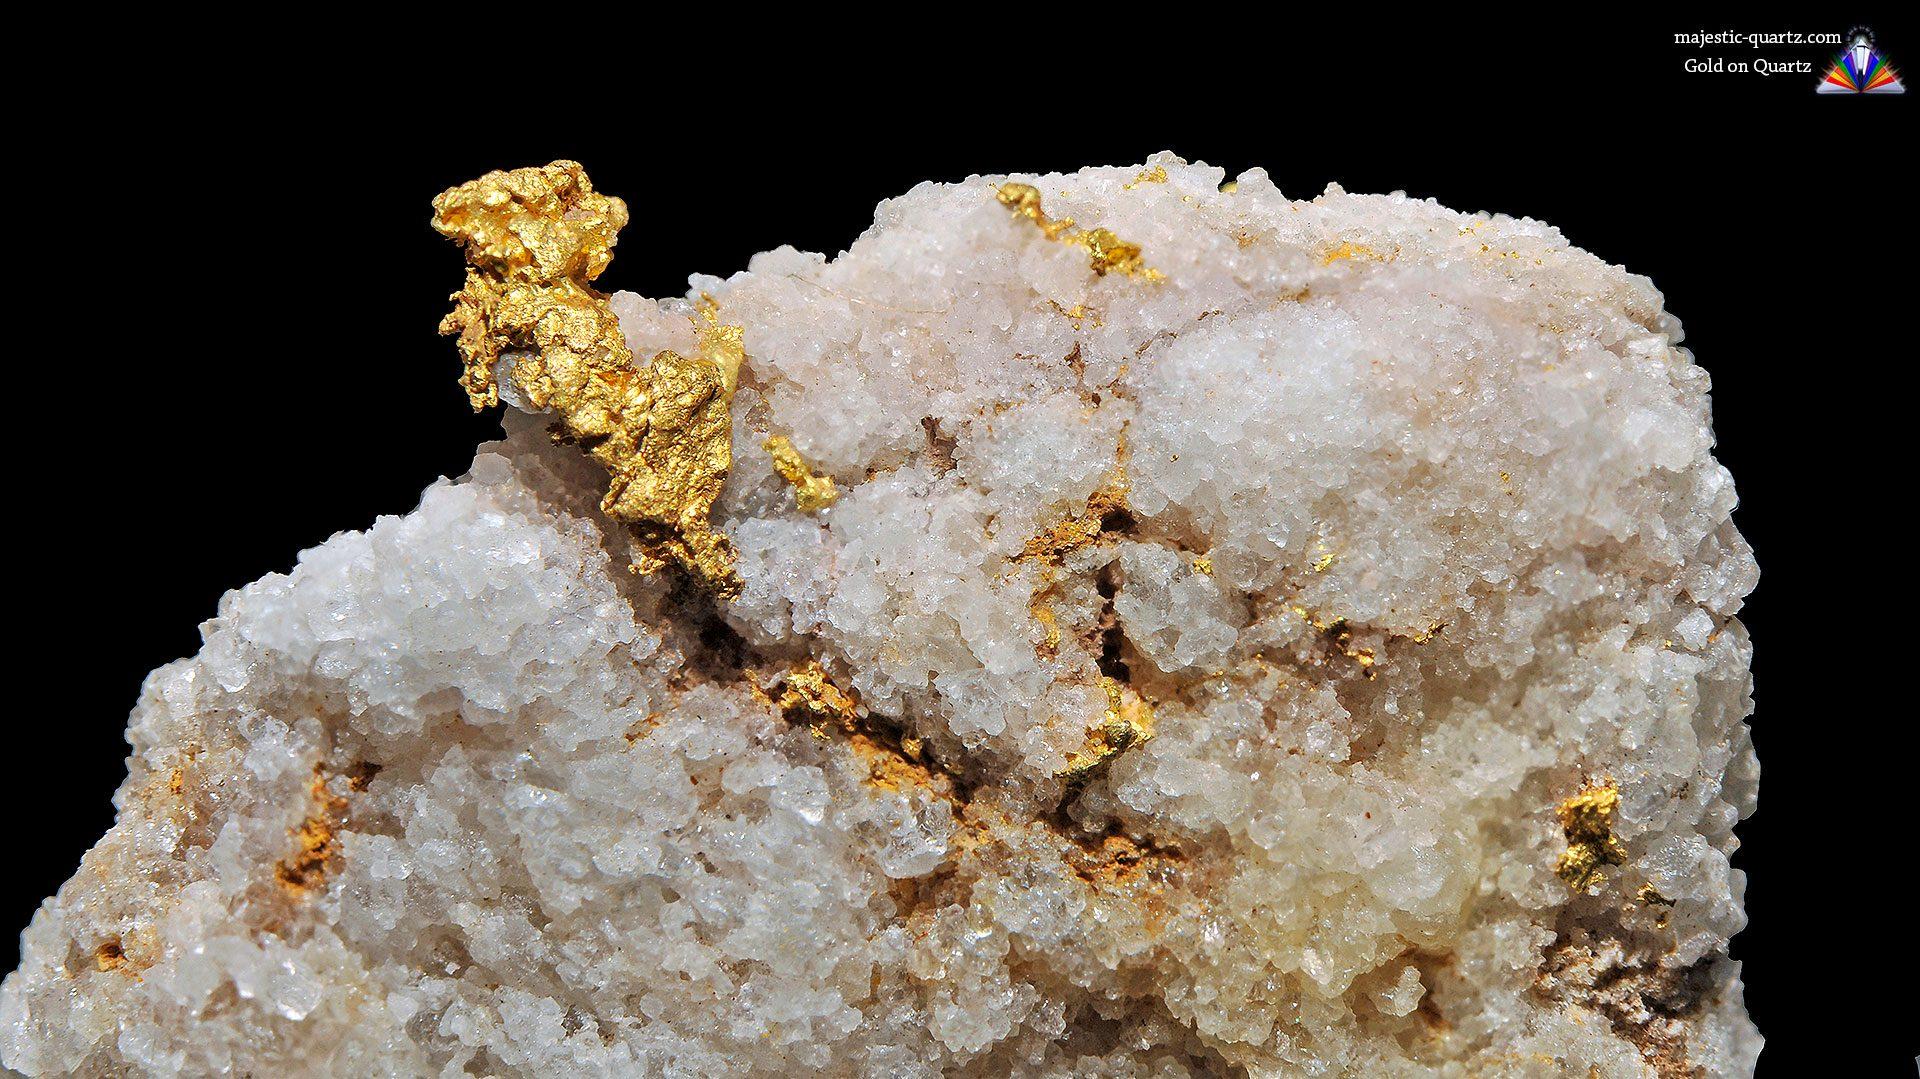 Gold Crystal Specimen - Mineral Specimen (Original Photograph by Parent Géry)